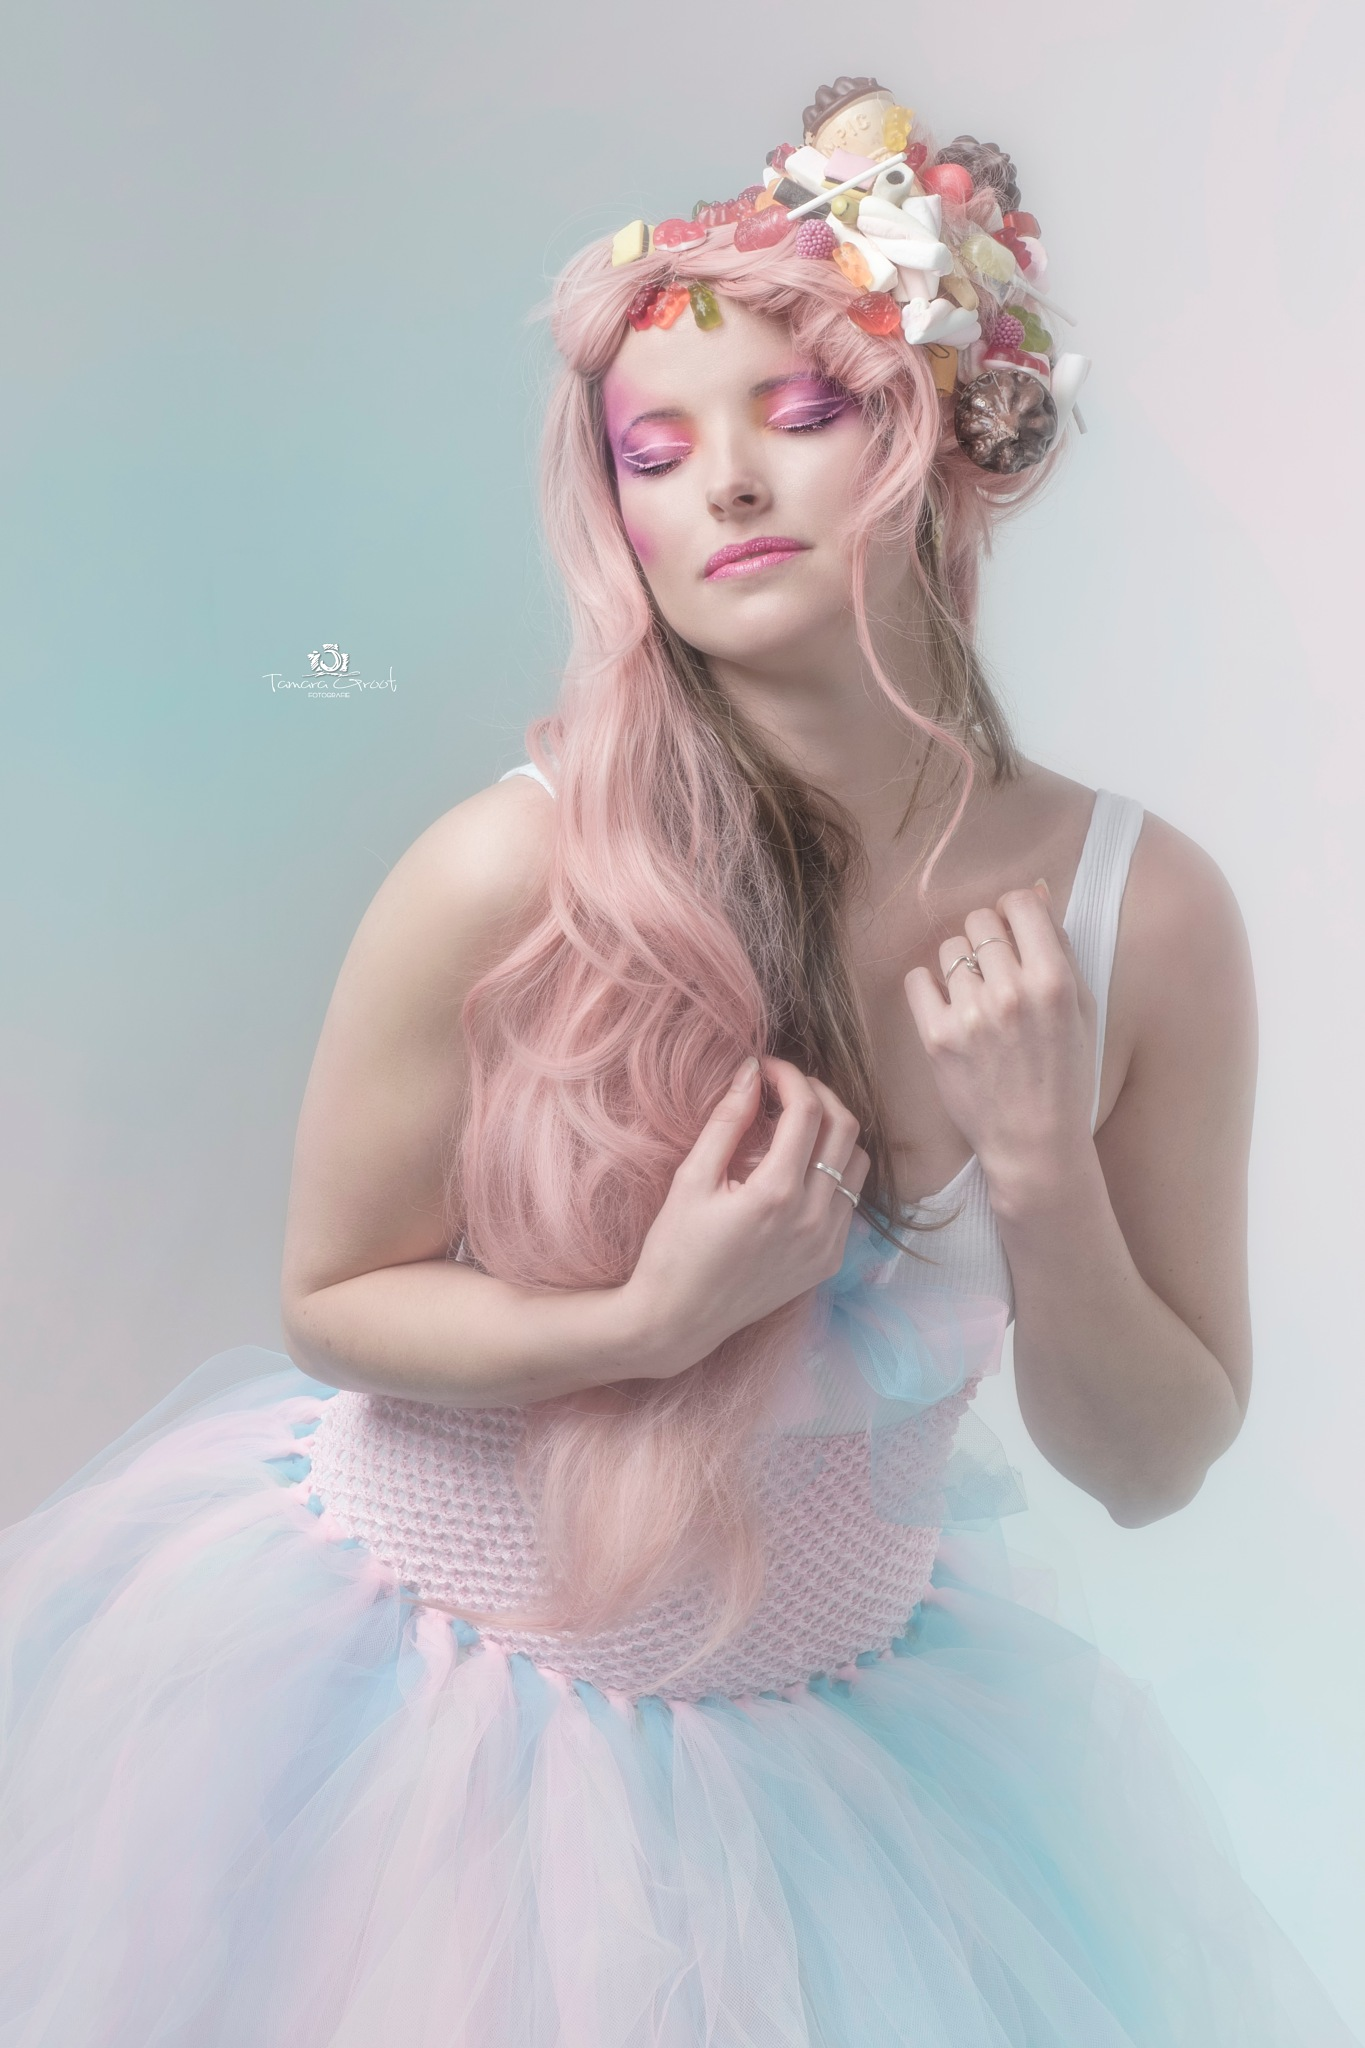 Candy Girl by Tamara Groot